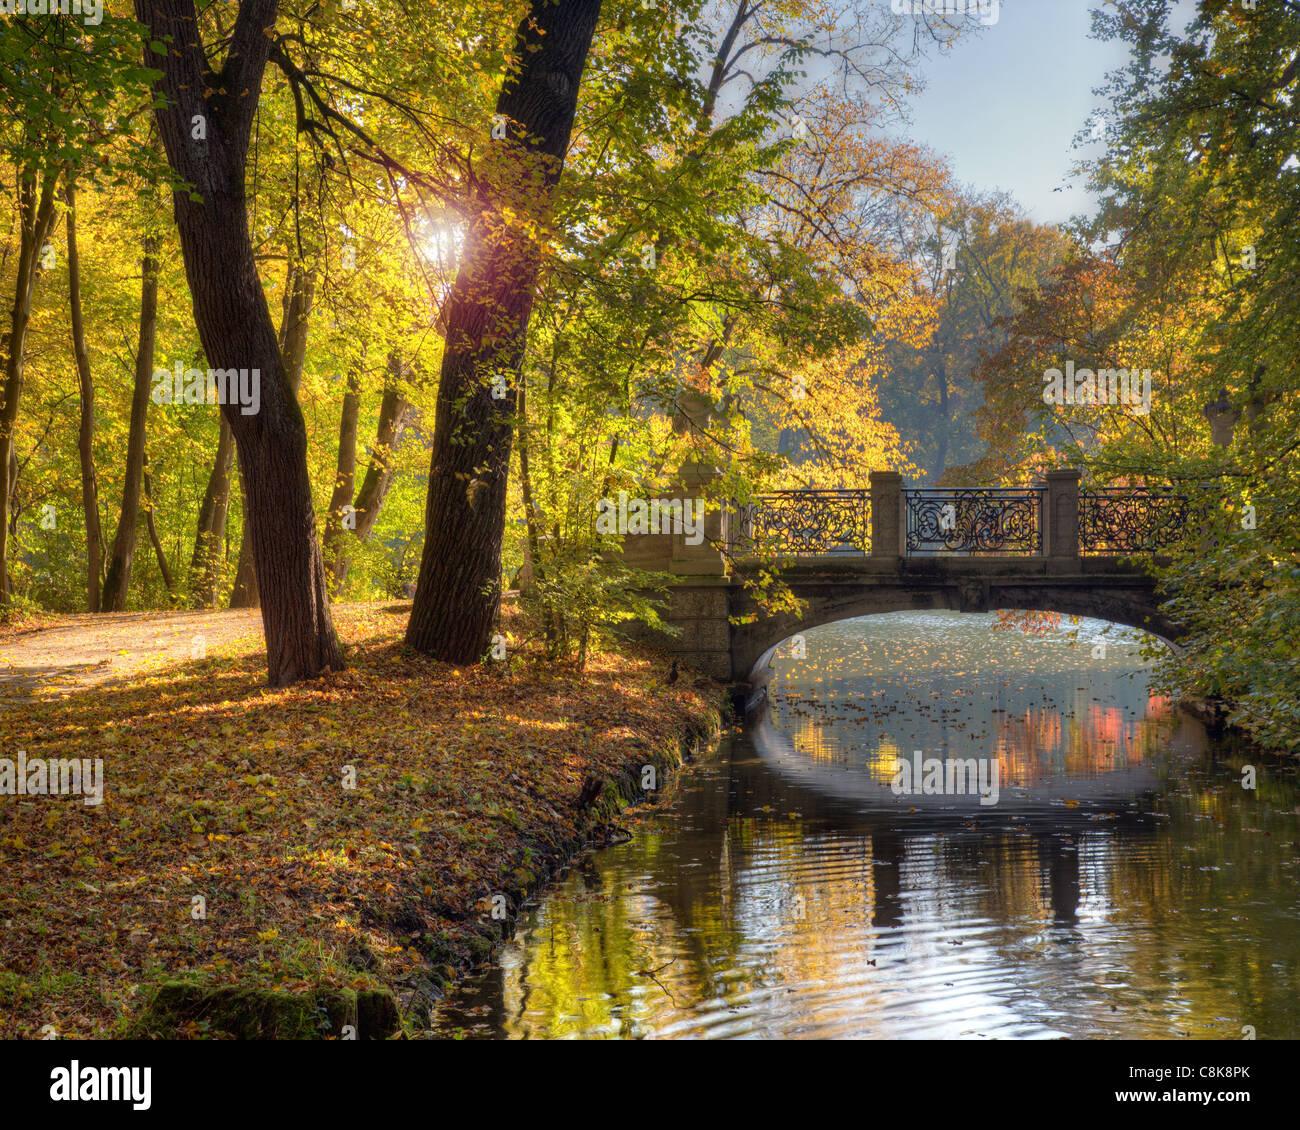 DE - BAVARIA: Autumn in park of Nymphenburg Palace, Munich - Stock Image